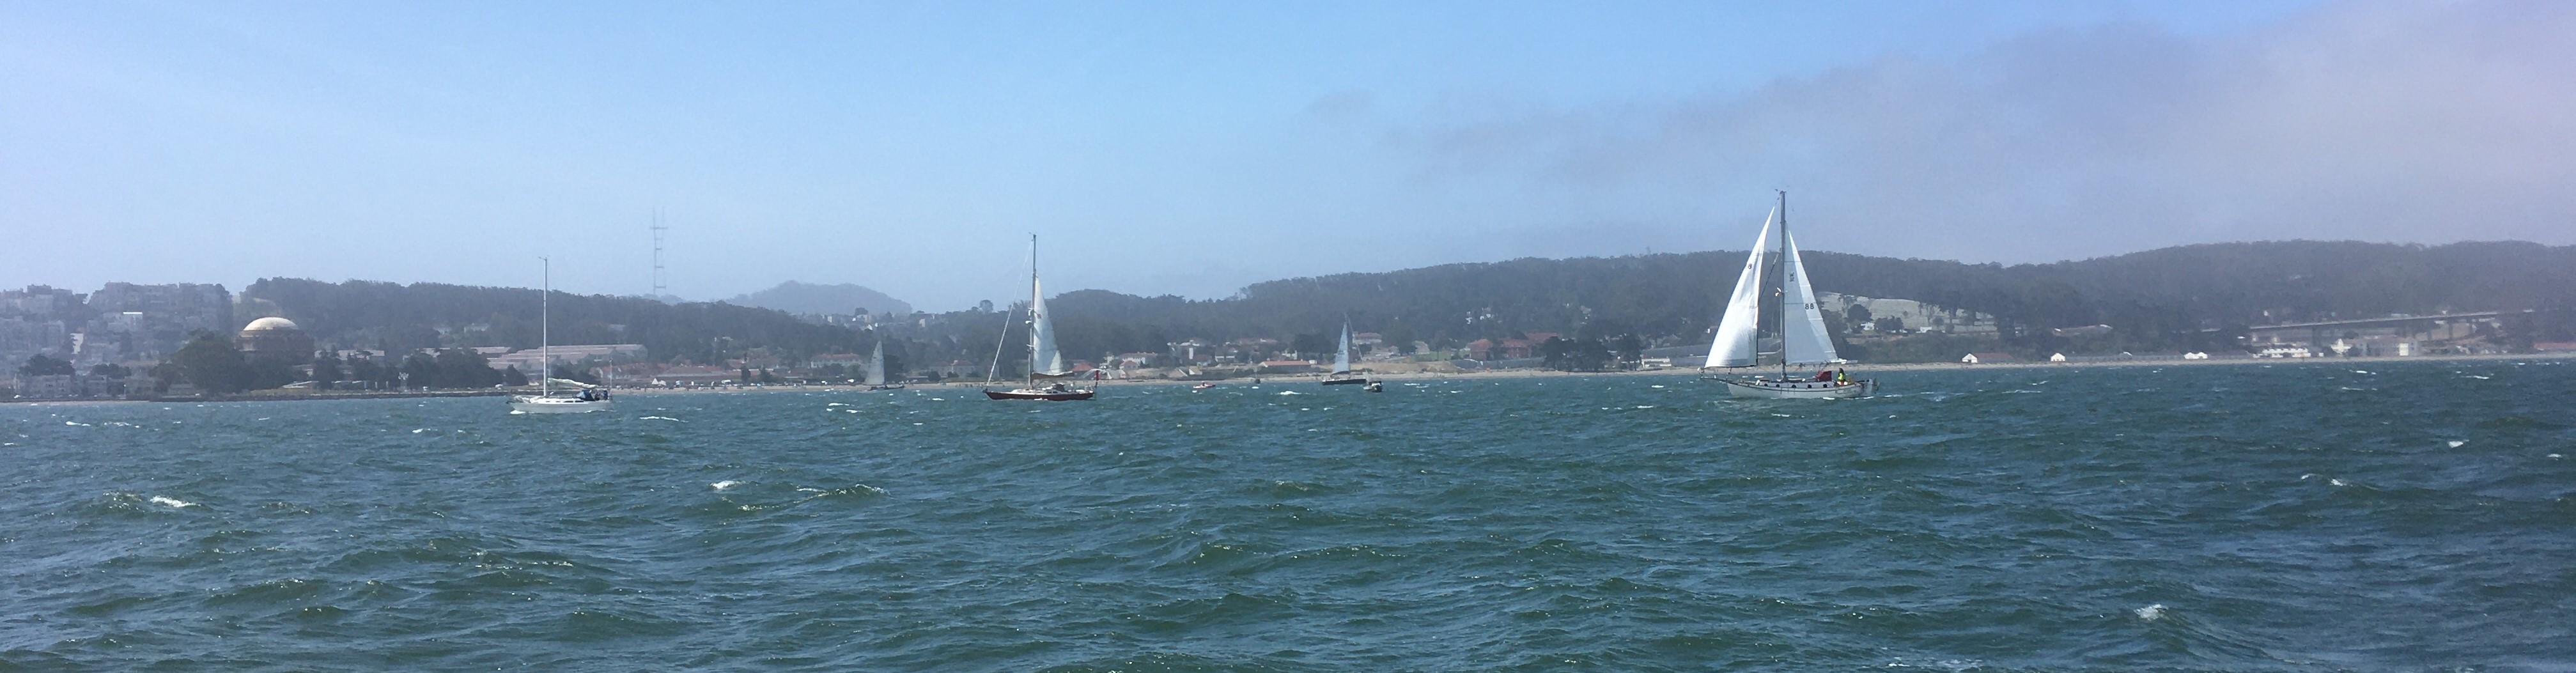 Name:  Sea Wisdom and Hula testing the ebb before the race.JPG Views: 218 Size:  686.2 KB